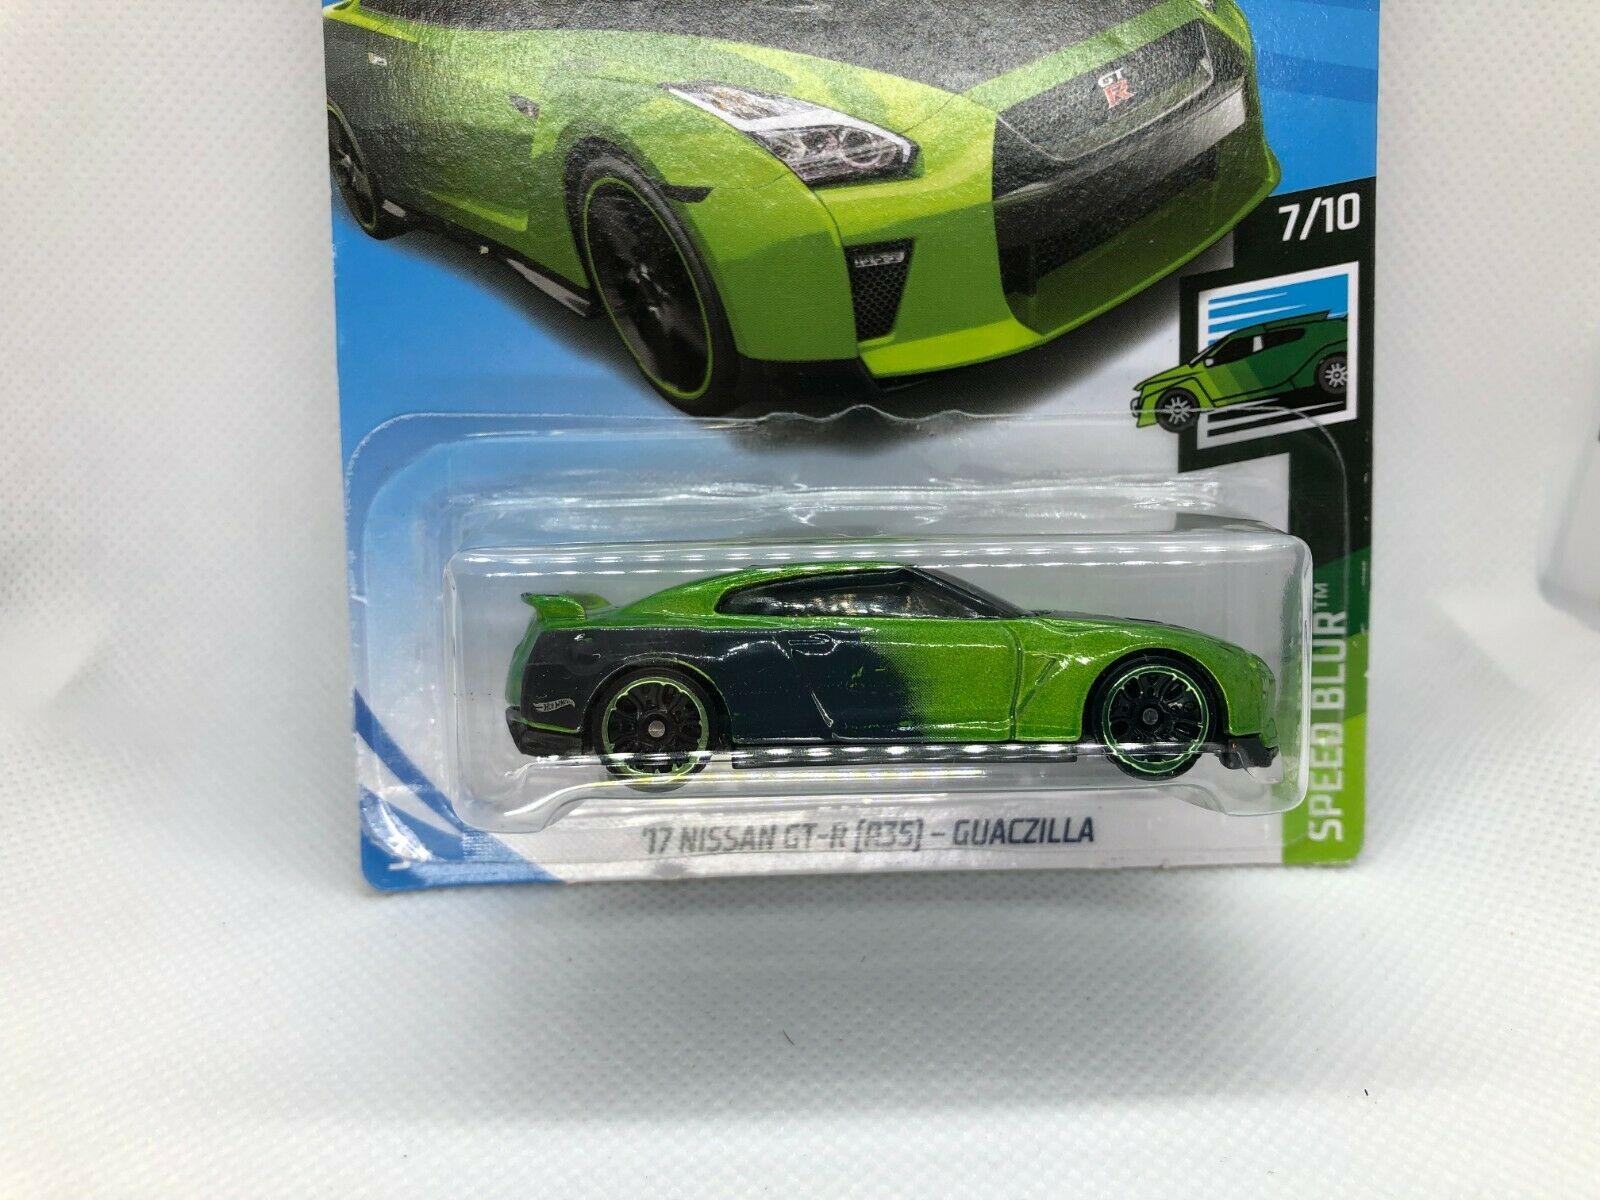 17 Nissan GT-R (R35) - Guaczilla